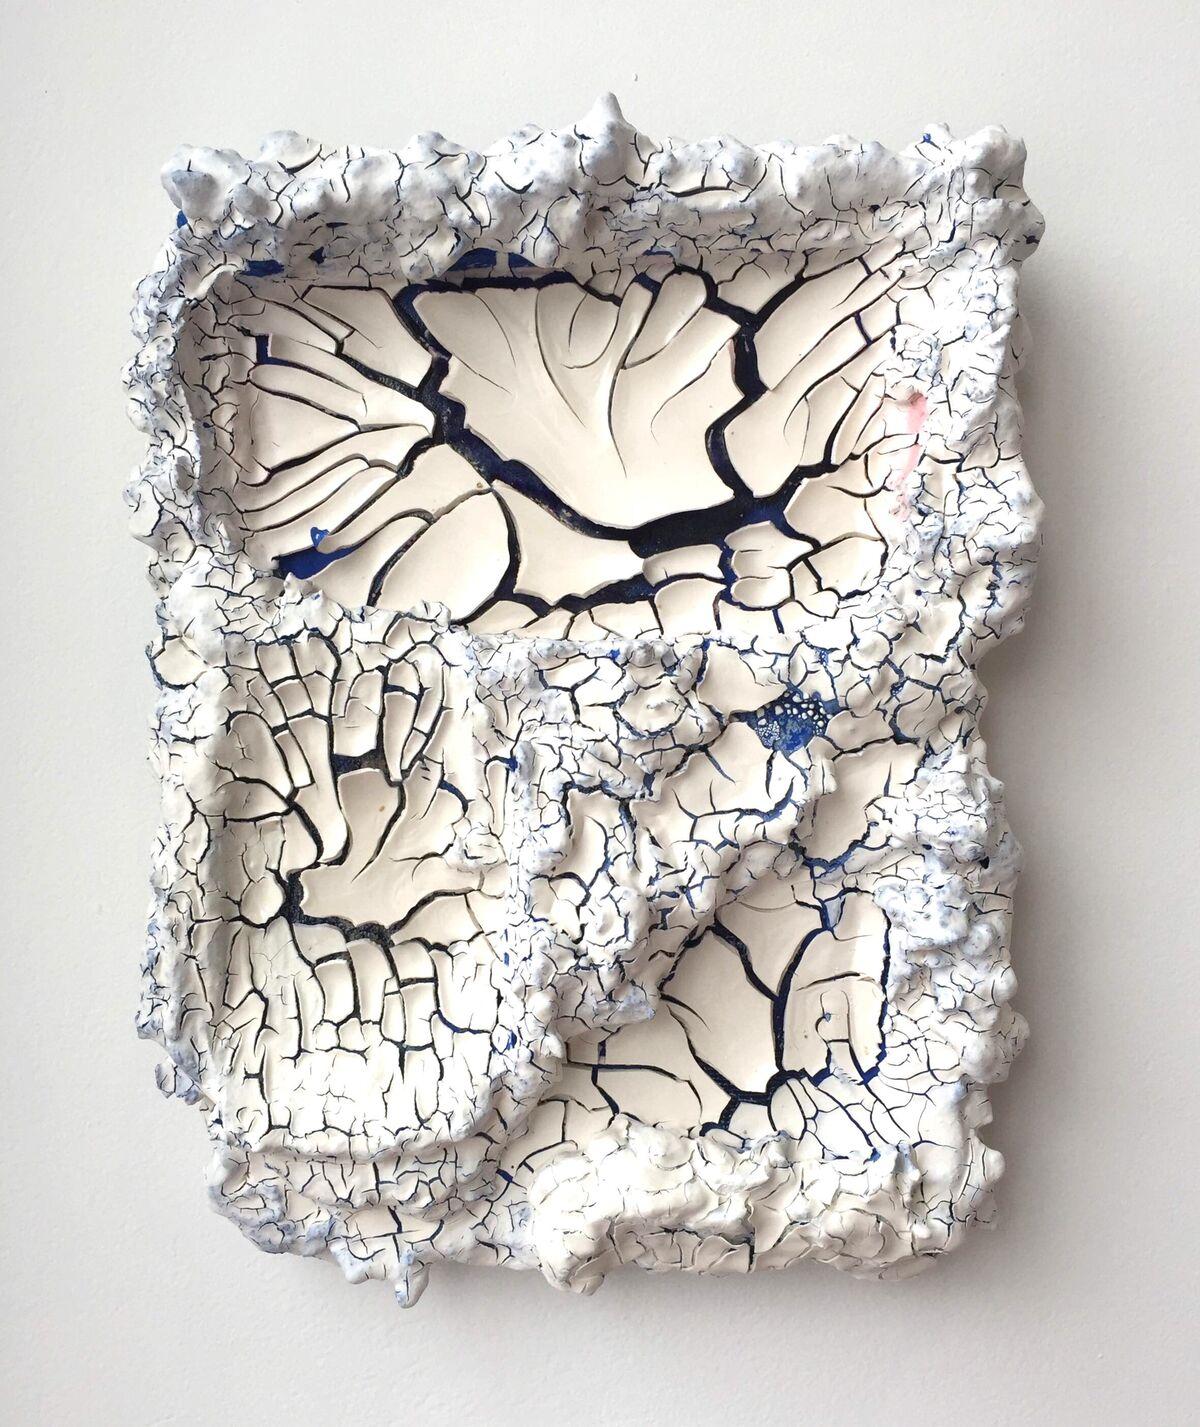 Brian Rochefort. Courtesy of the artist.